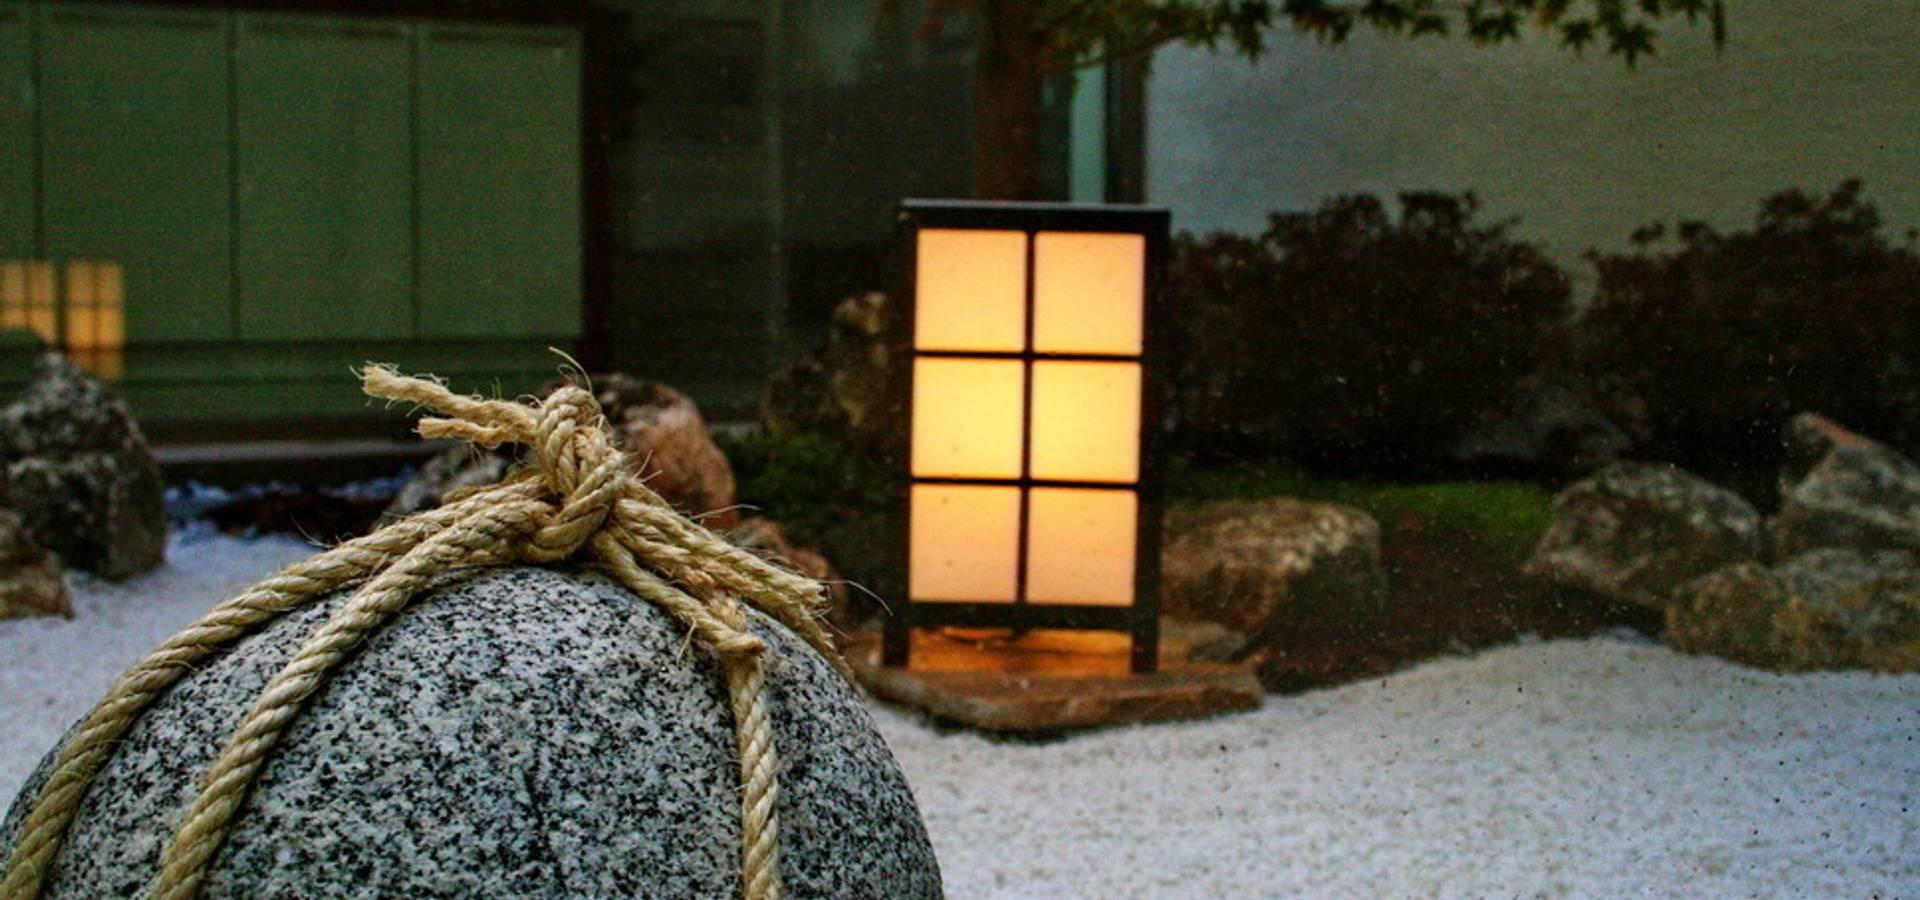 jardines japoneses estudio de paisajismo